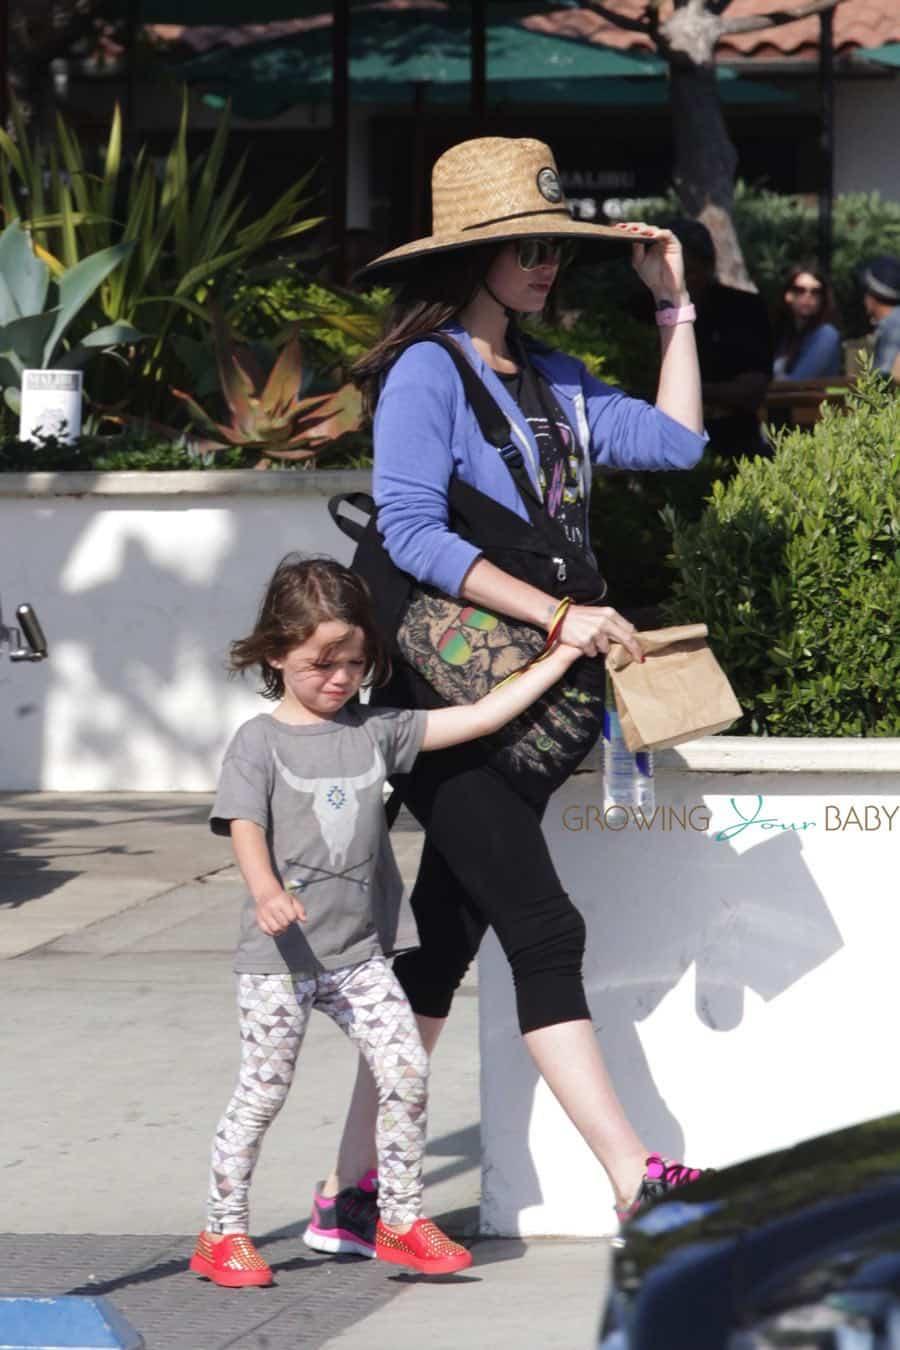 Pregnant Megan Fox at the park with son Noah Green ...